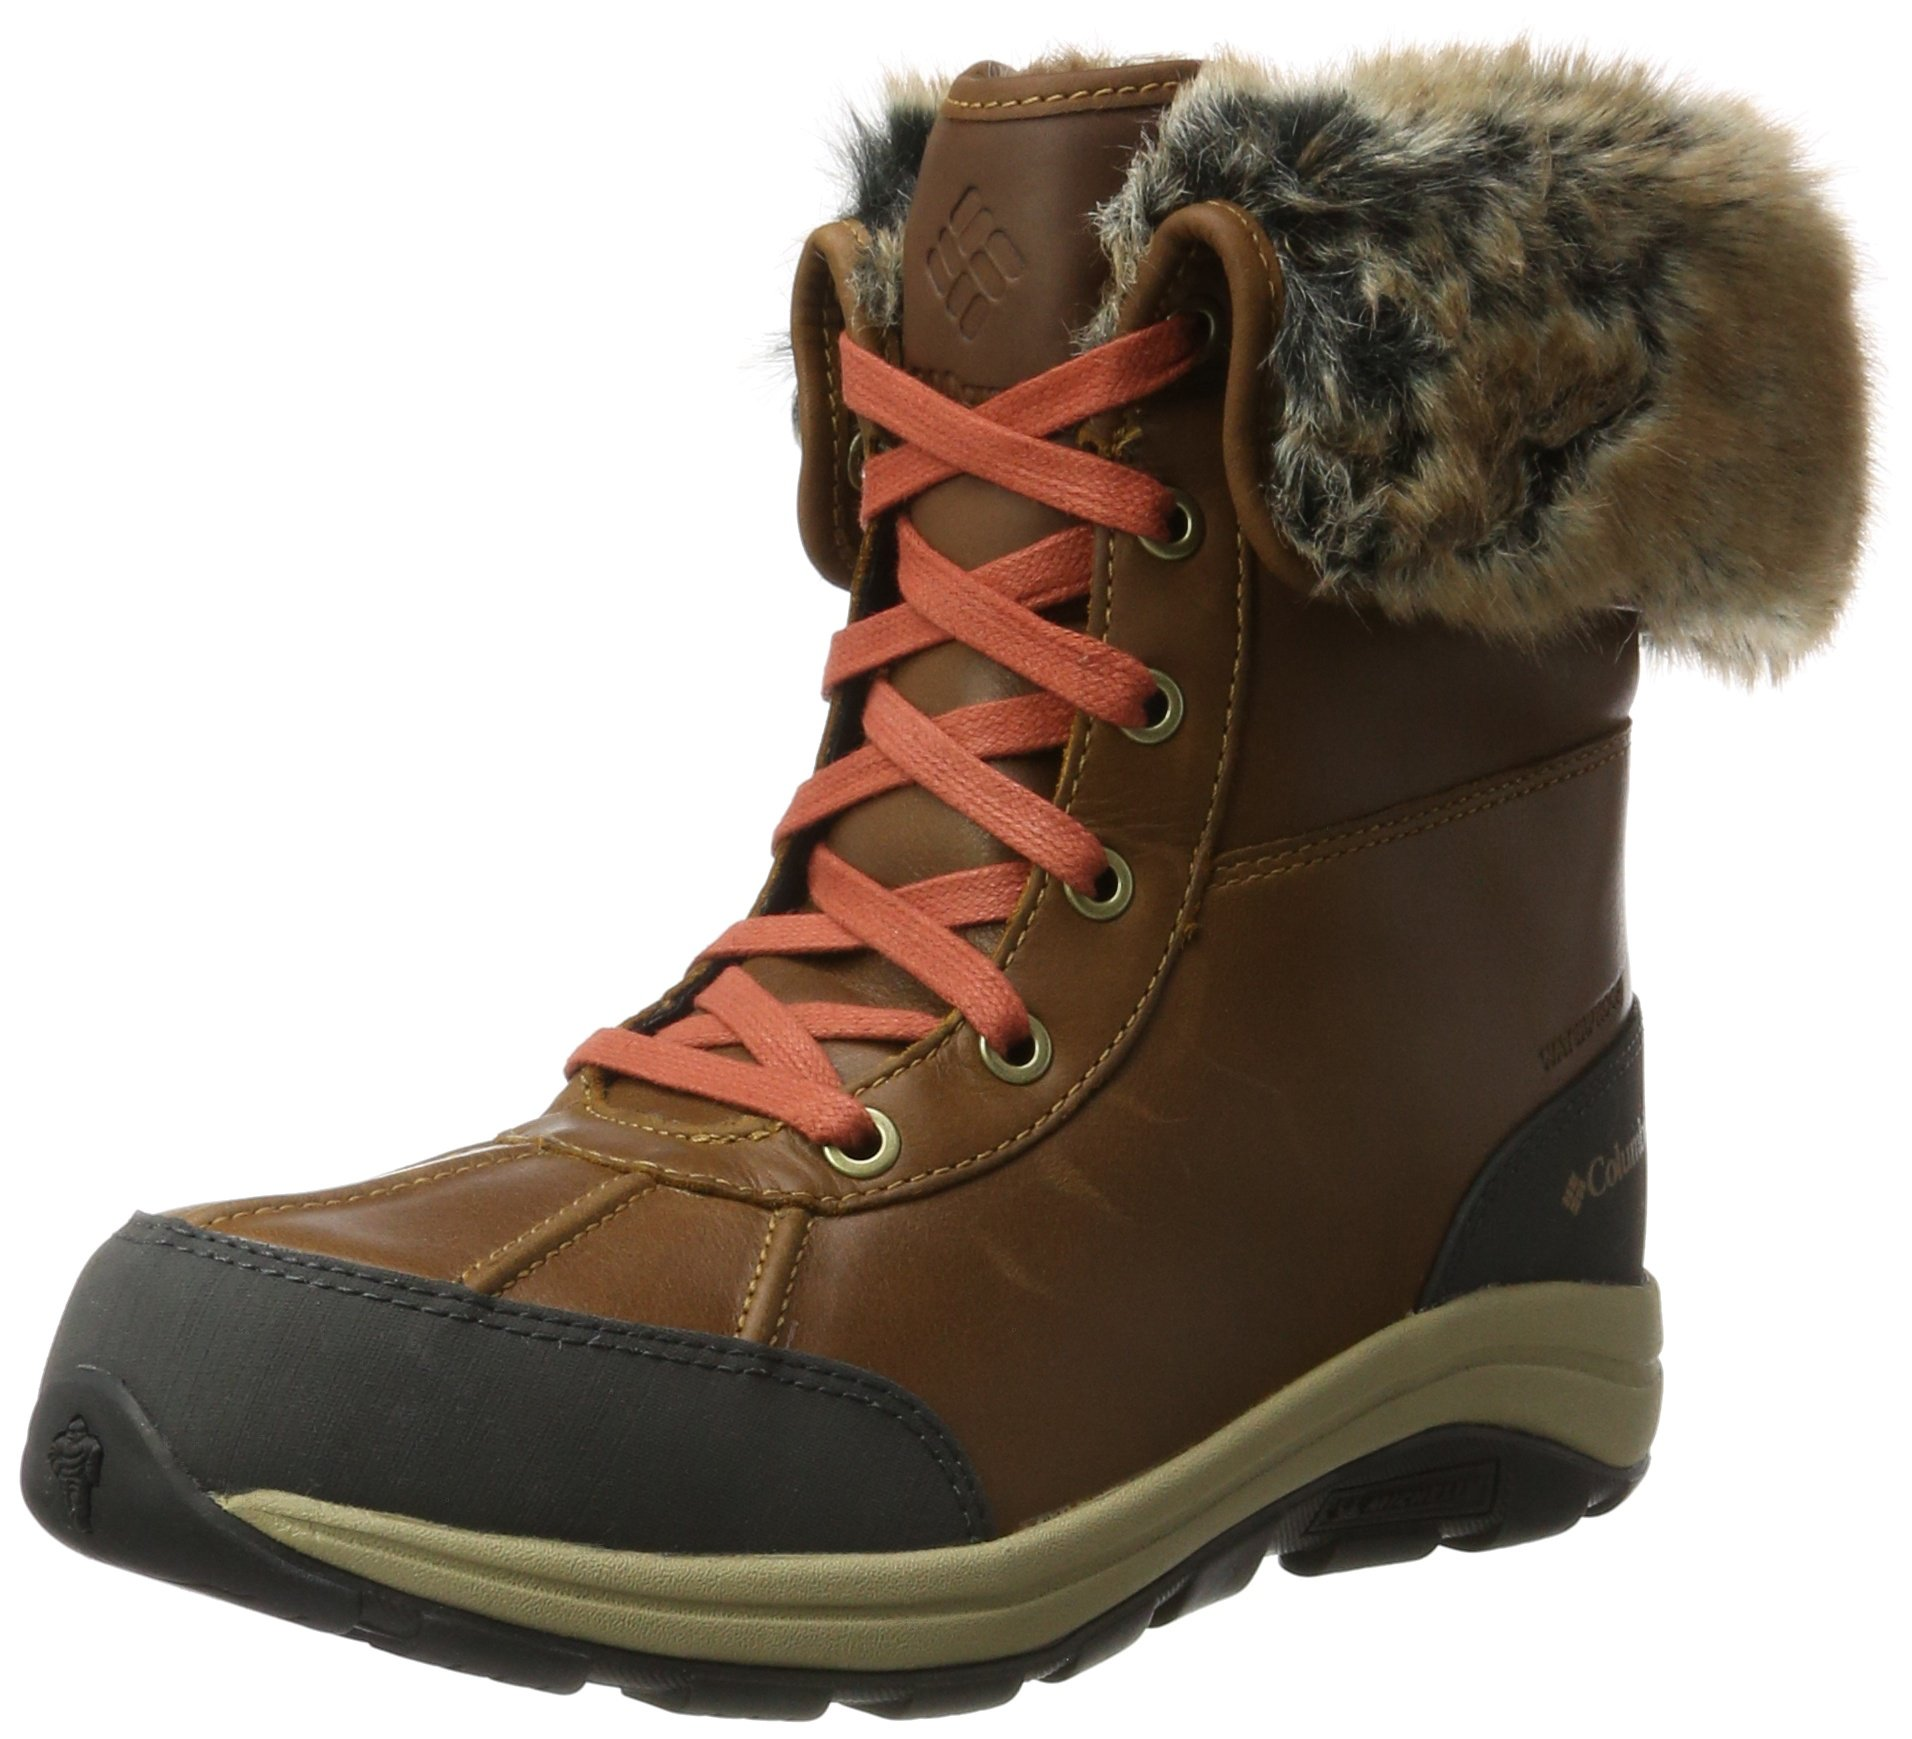 Columbia Bangor Omni-Heat Boot - Elk/Rusty - Womens - 7.5 by Columbia